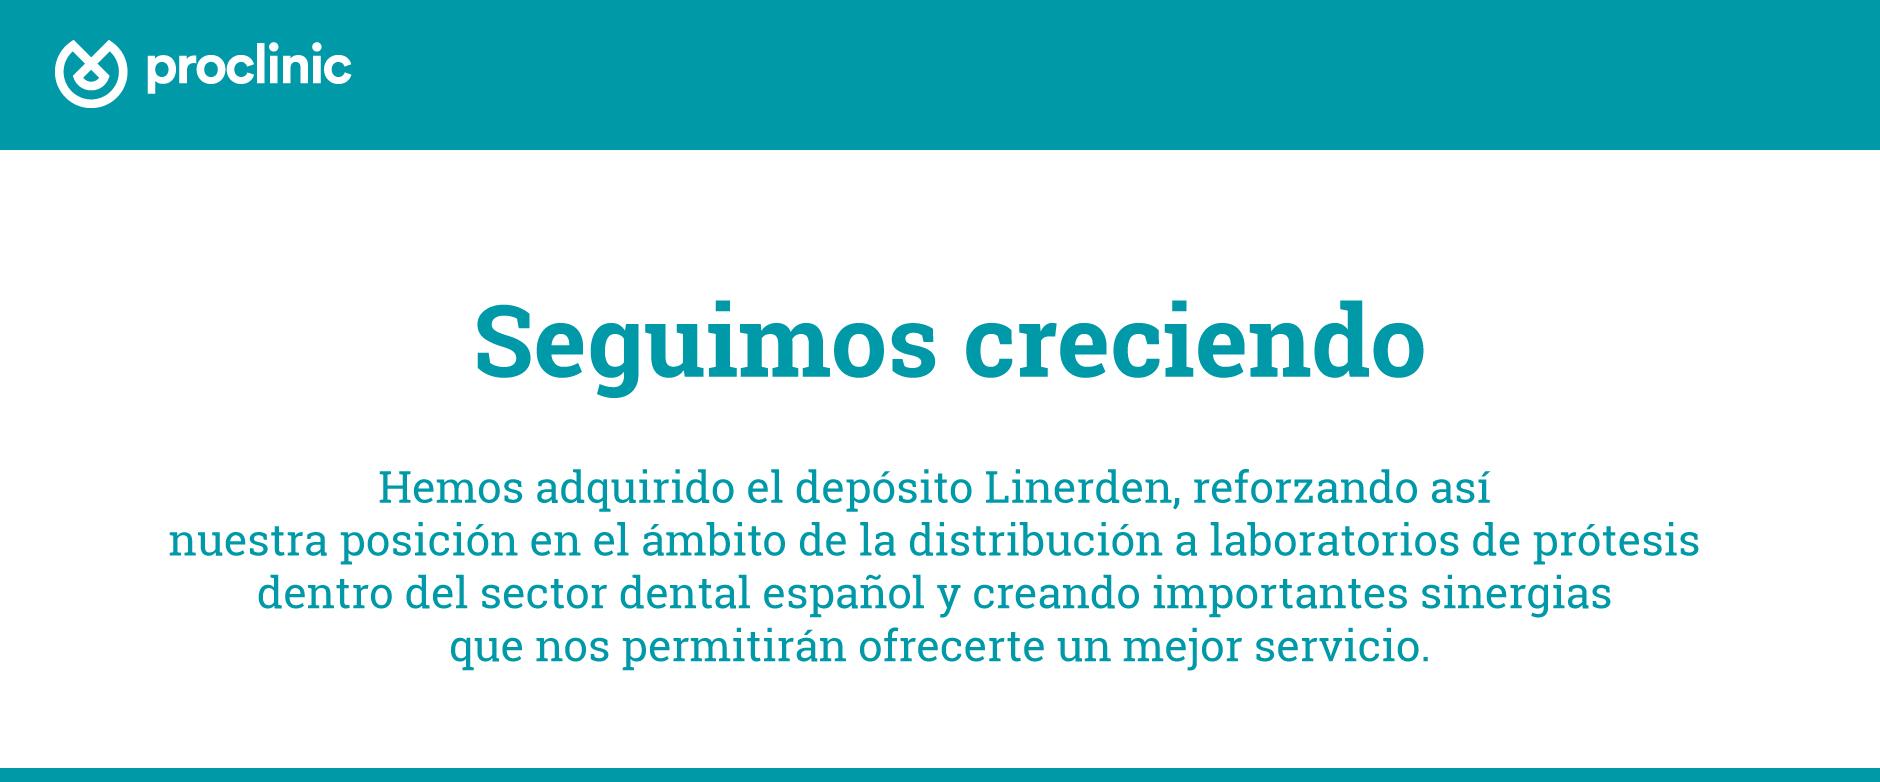 Linerden y Proclinic